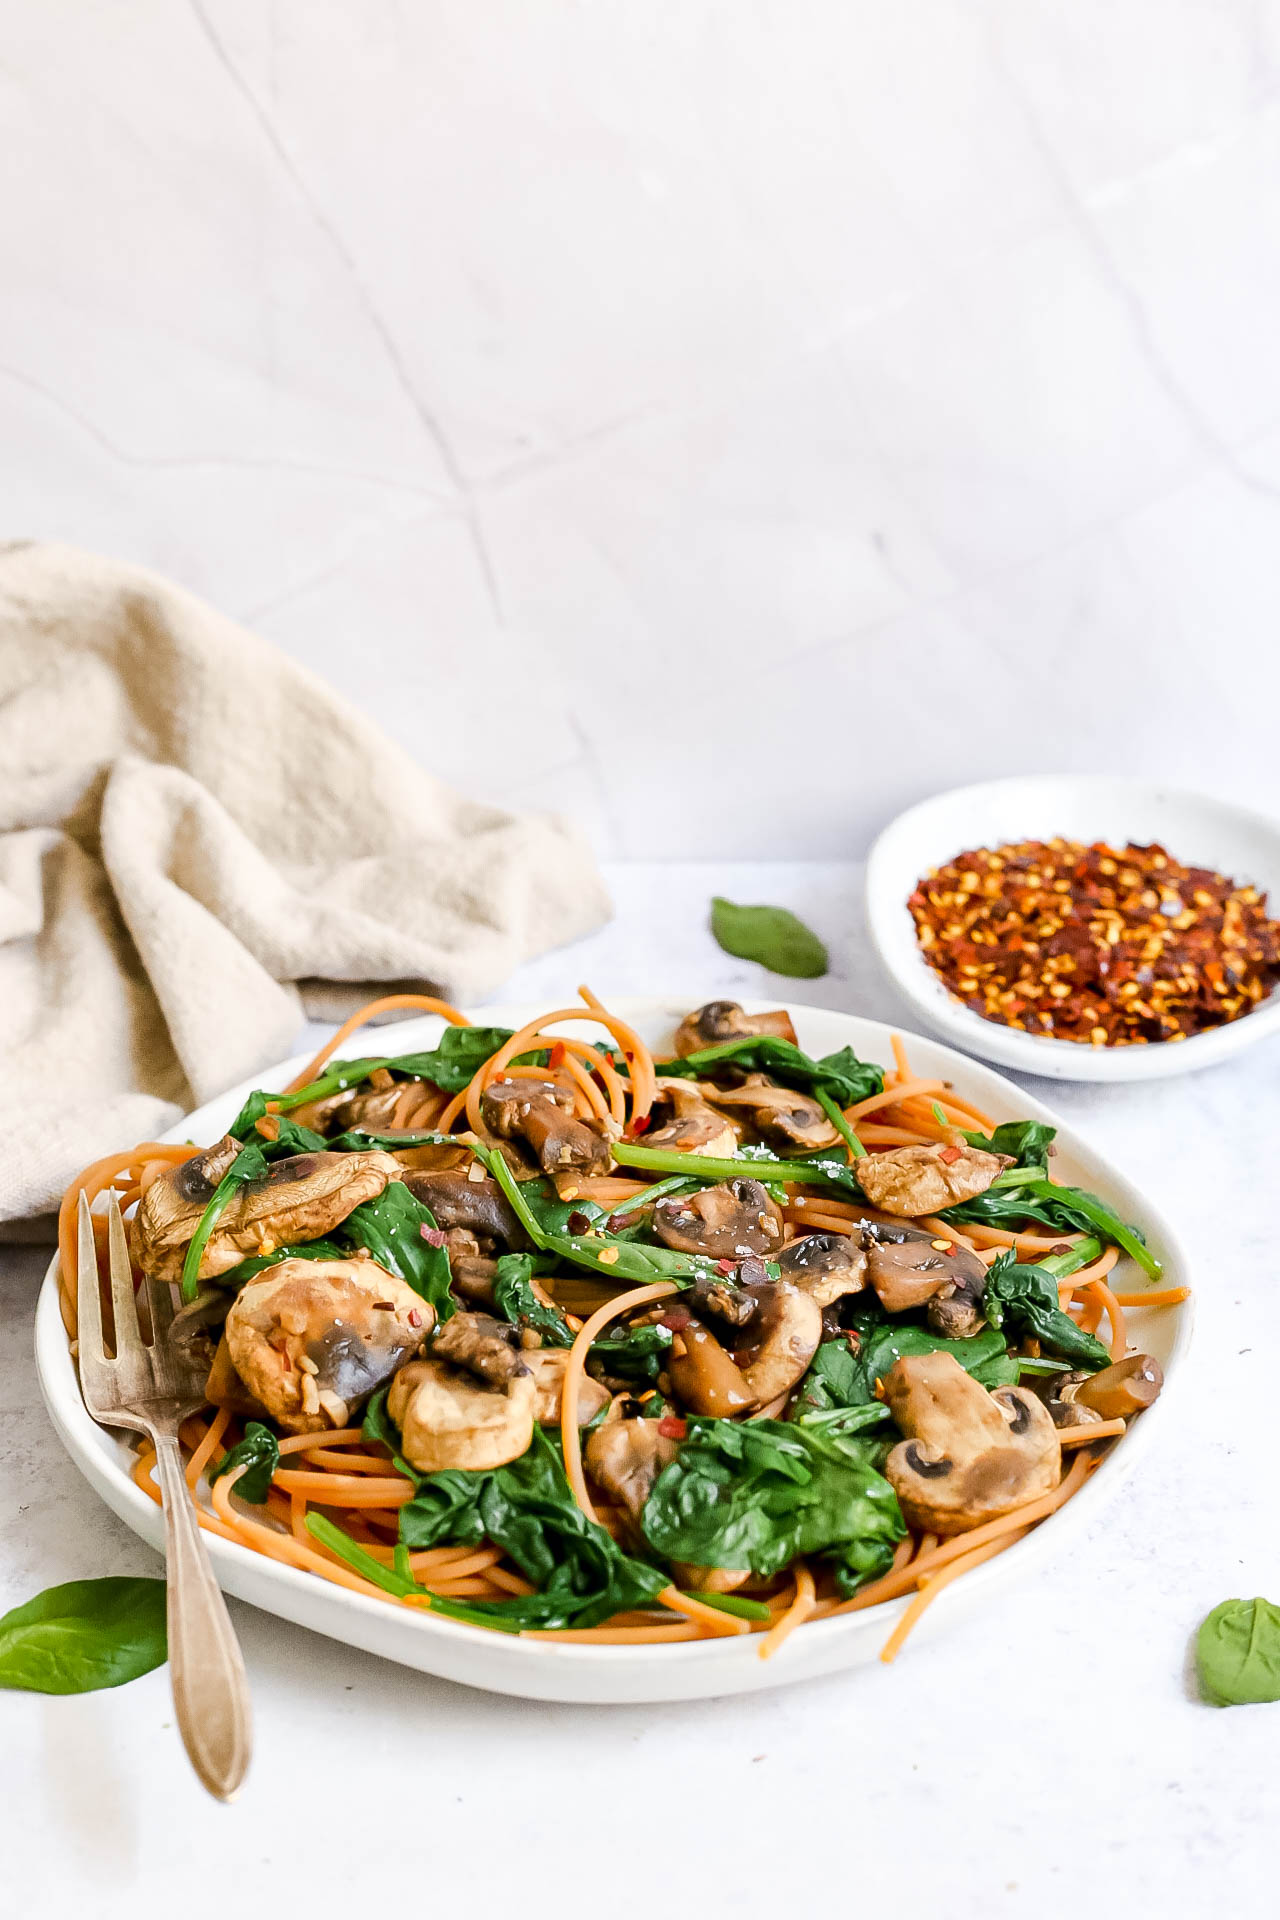 Oil-Free Vegan Spinach-Mushroom Pasta